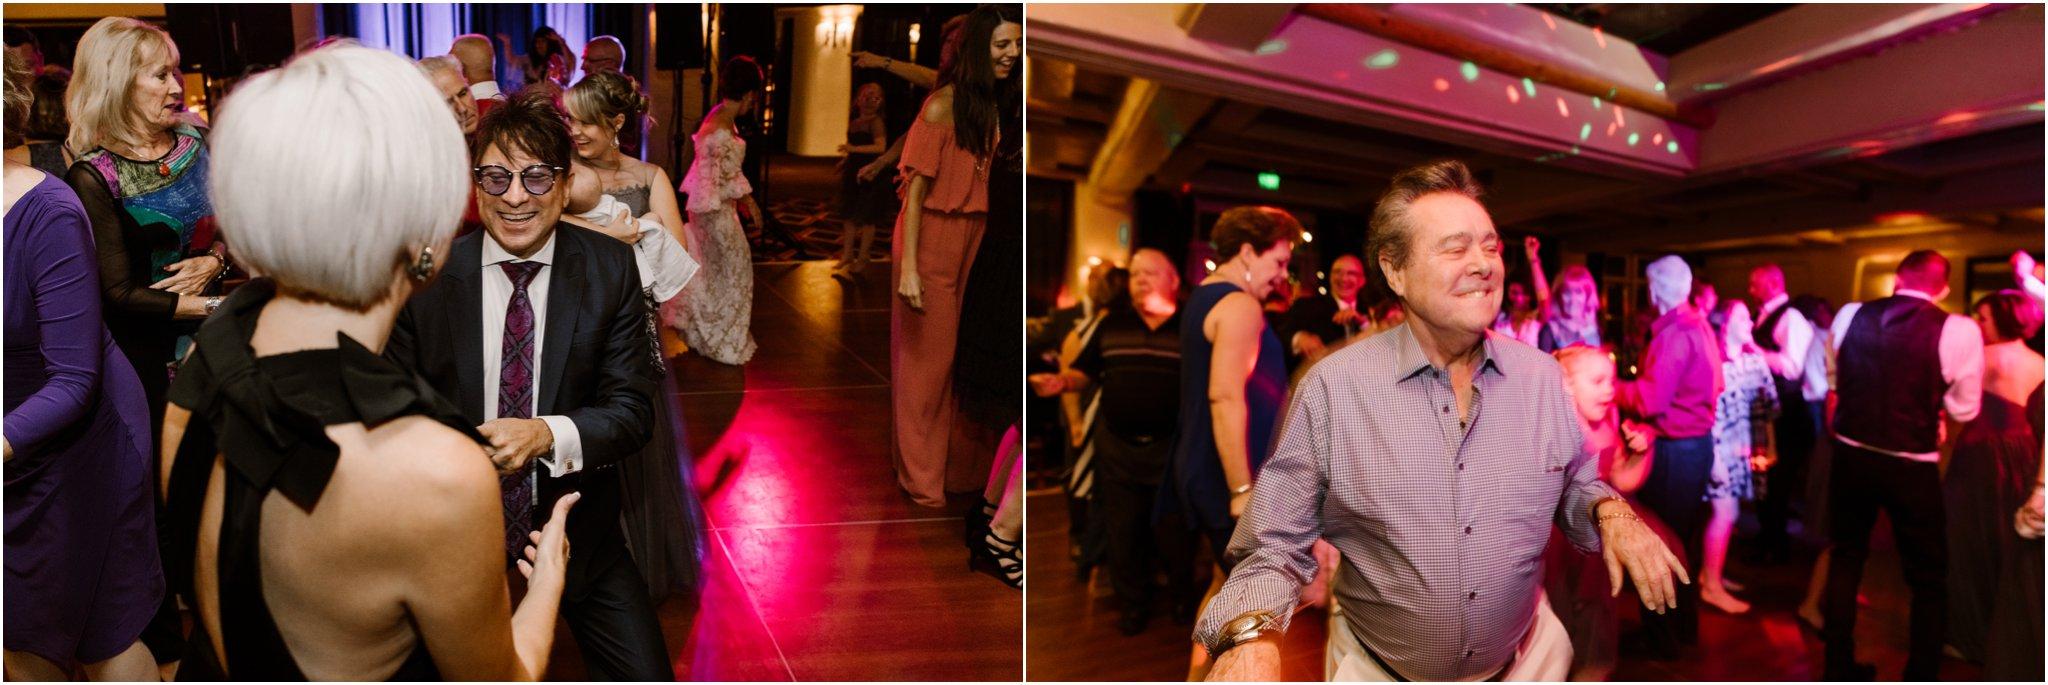 0054Santa Fe Wedding _Inn and Spa at Loretto Wedding, Inn and Spa at Loretto wedding, Santa Fe wedding photographers, blue rose photography